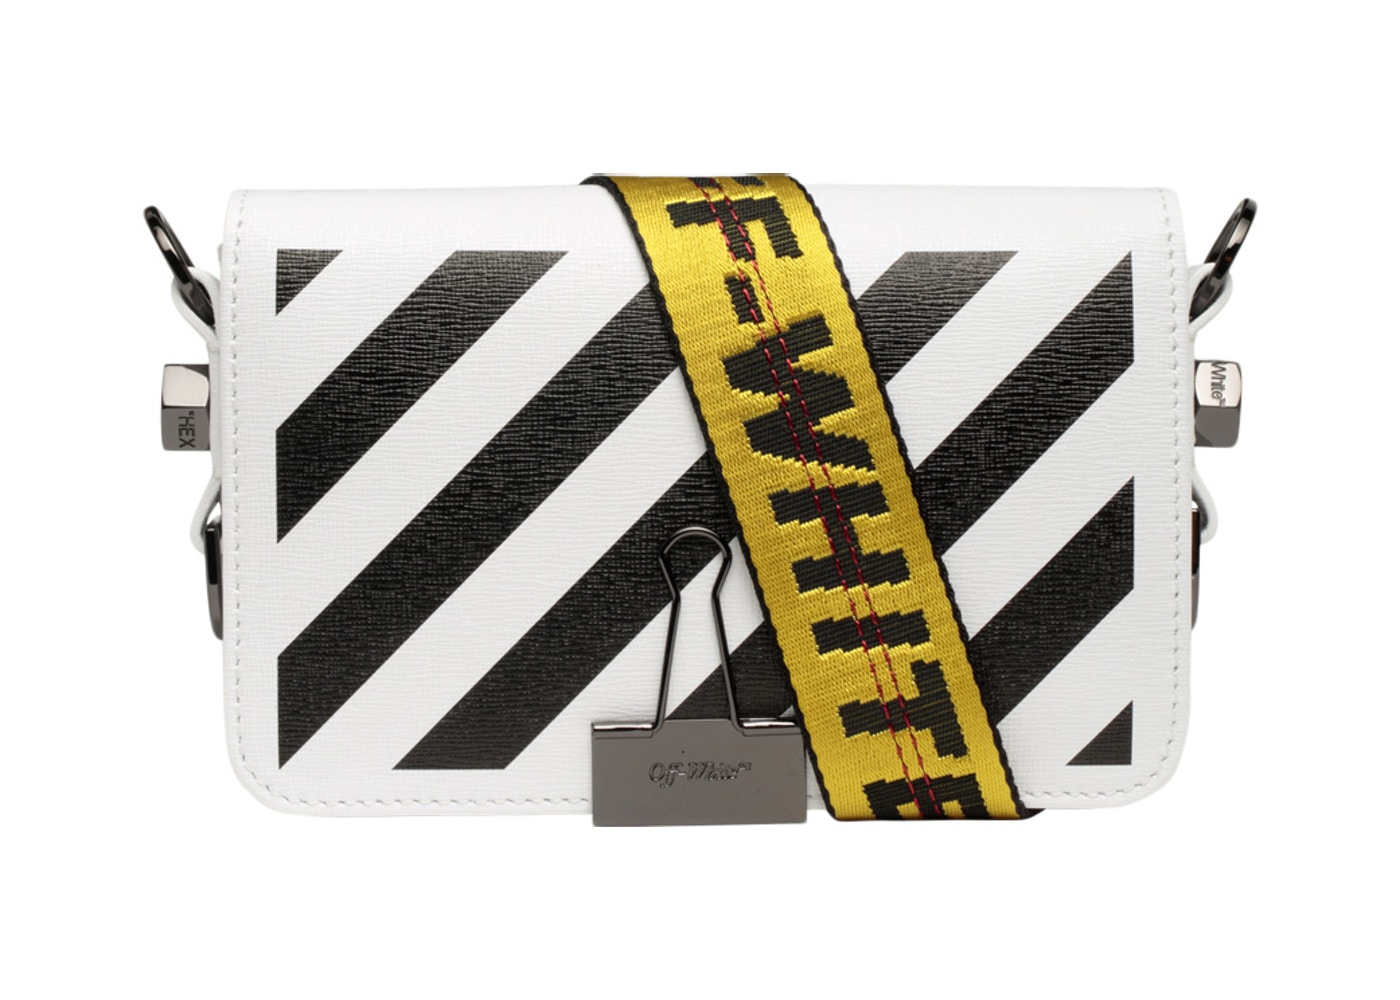 82fdee75 OFF-WHITE Binder Clip Bag Diag Mini White Black Yellow. Diag Mini White  Black Yellow